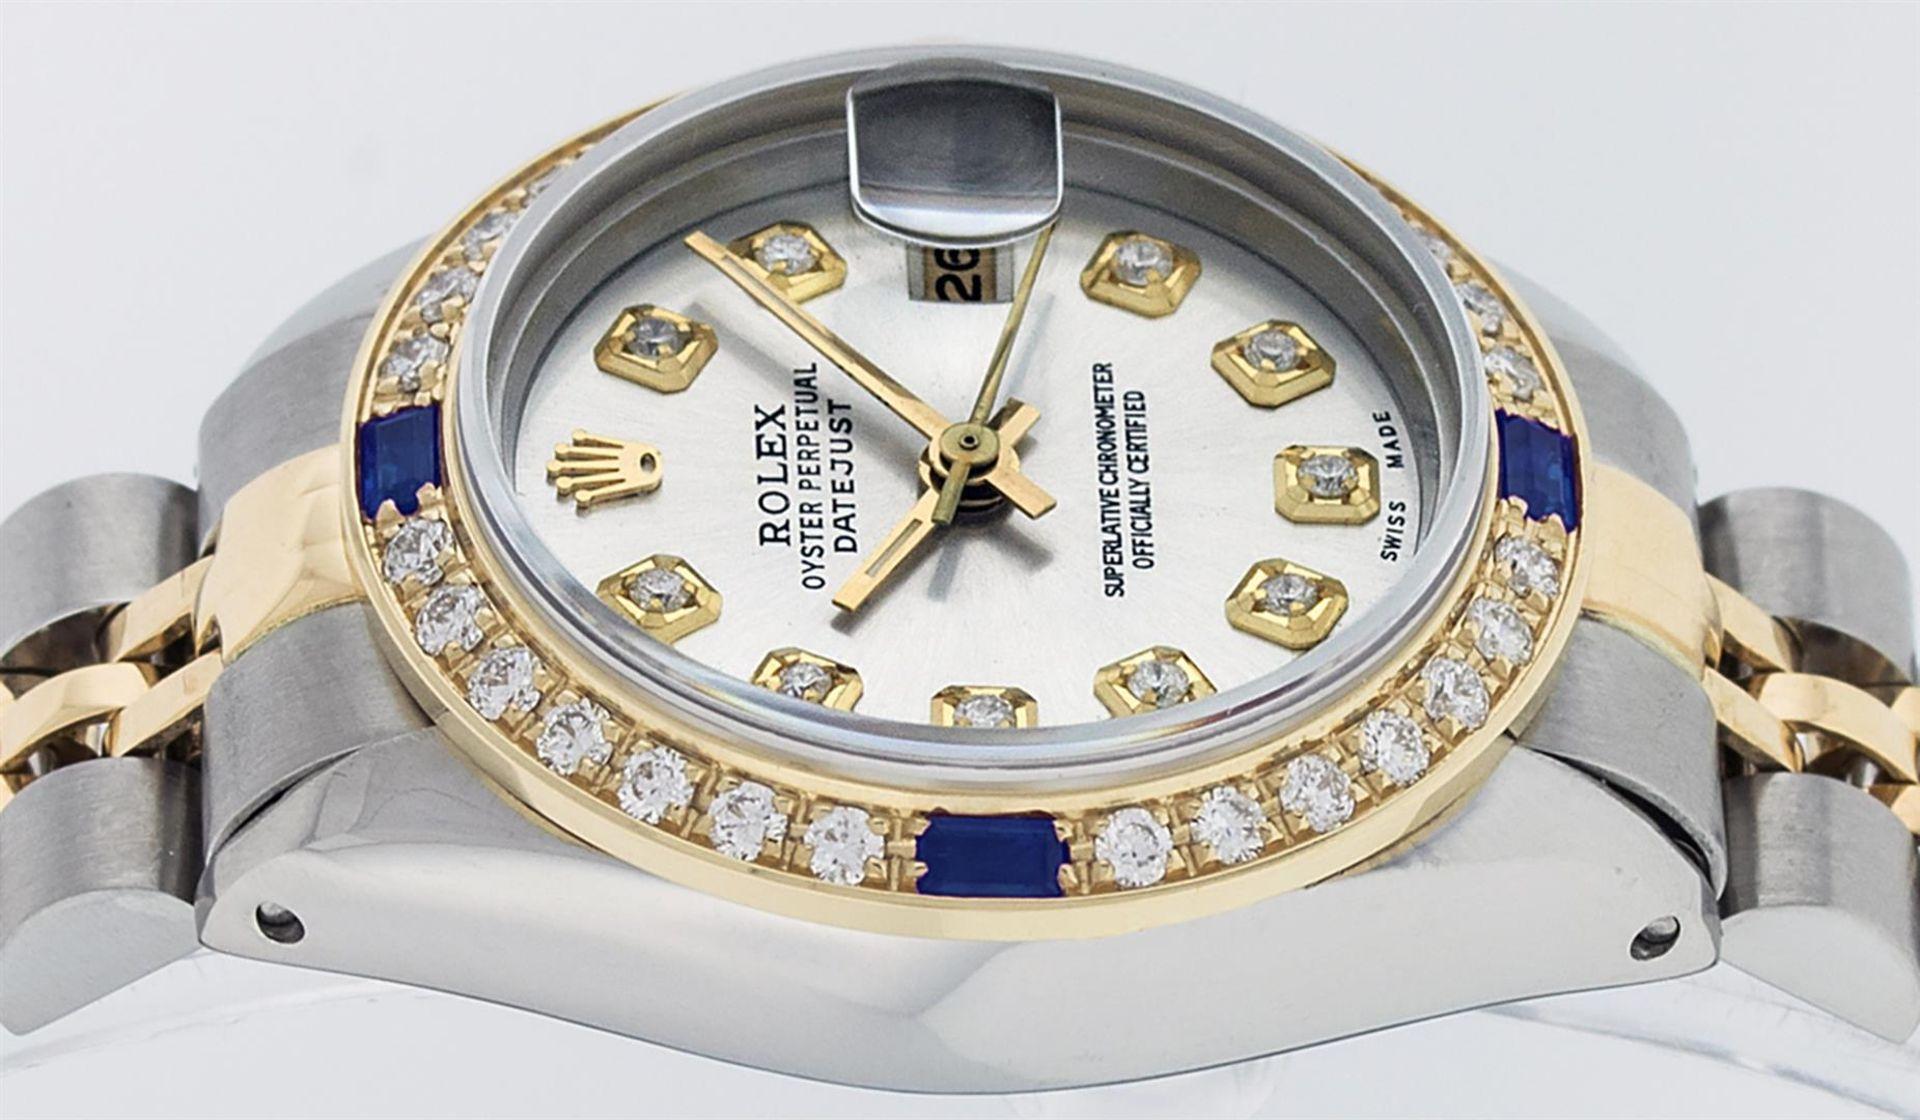 Rolex Ladies 2 Tone Silver Diamond & Sapphire Datejust Wristwatch - Image 4 of 9